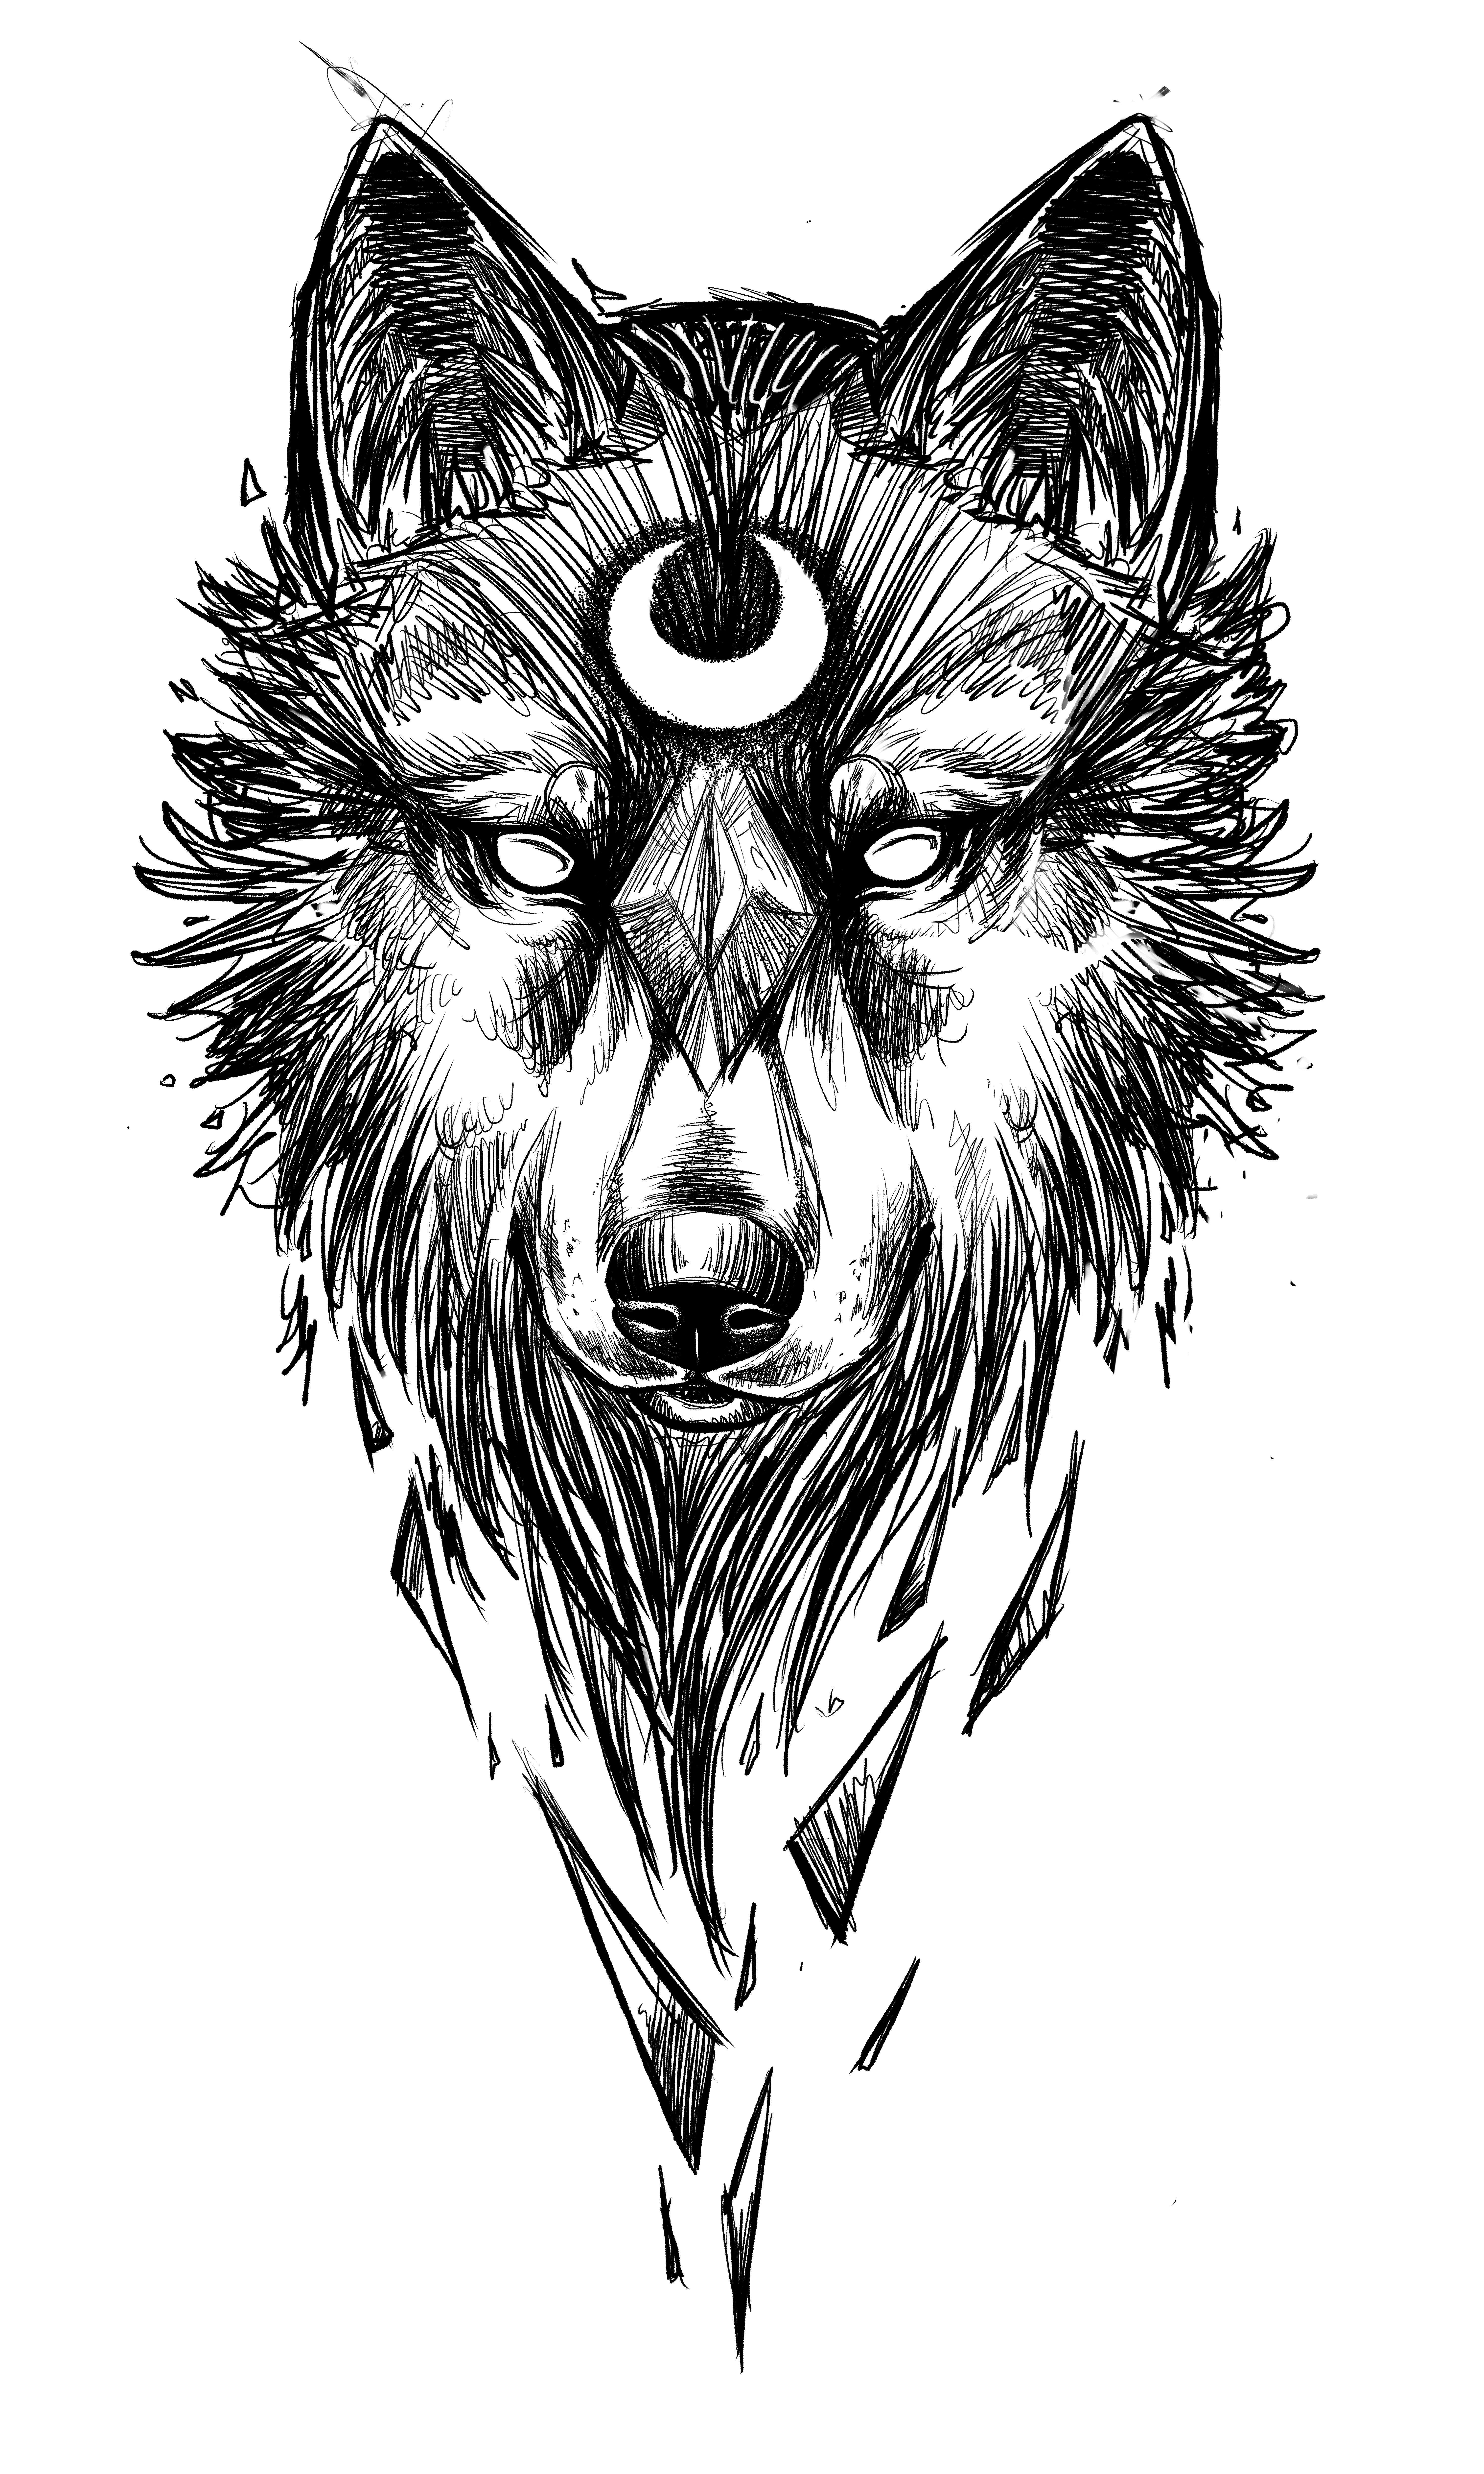 Sketch Wolf Tattoo Design By Chestnut Tattoo Informationen Zu Sketch Wolf Tattoo Design By Chestnut Tattoo Pin Si In 2020 Wolf Tattoo Design Wolf Tattoos Wolf Tattoo